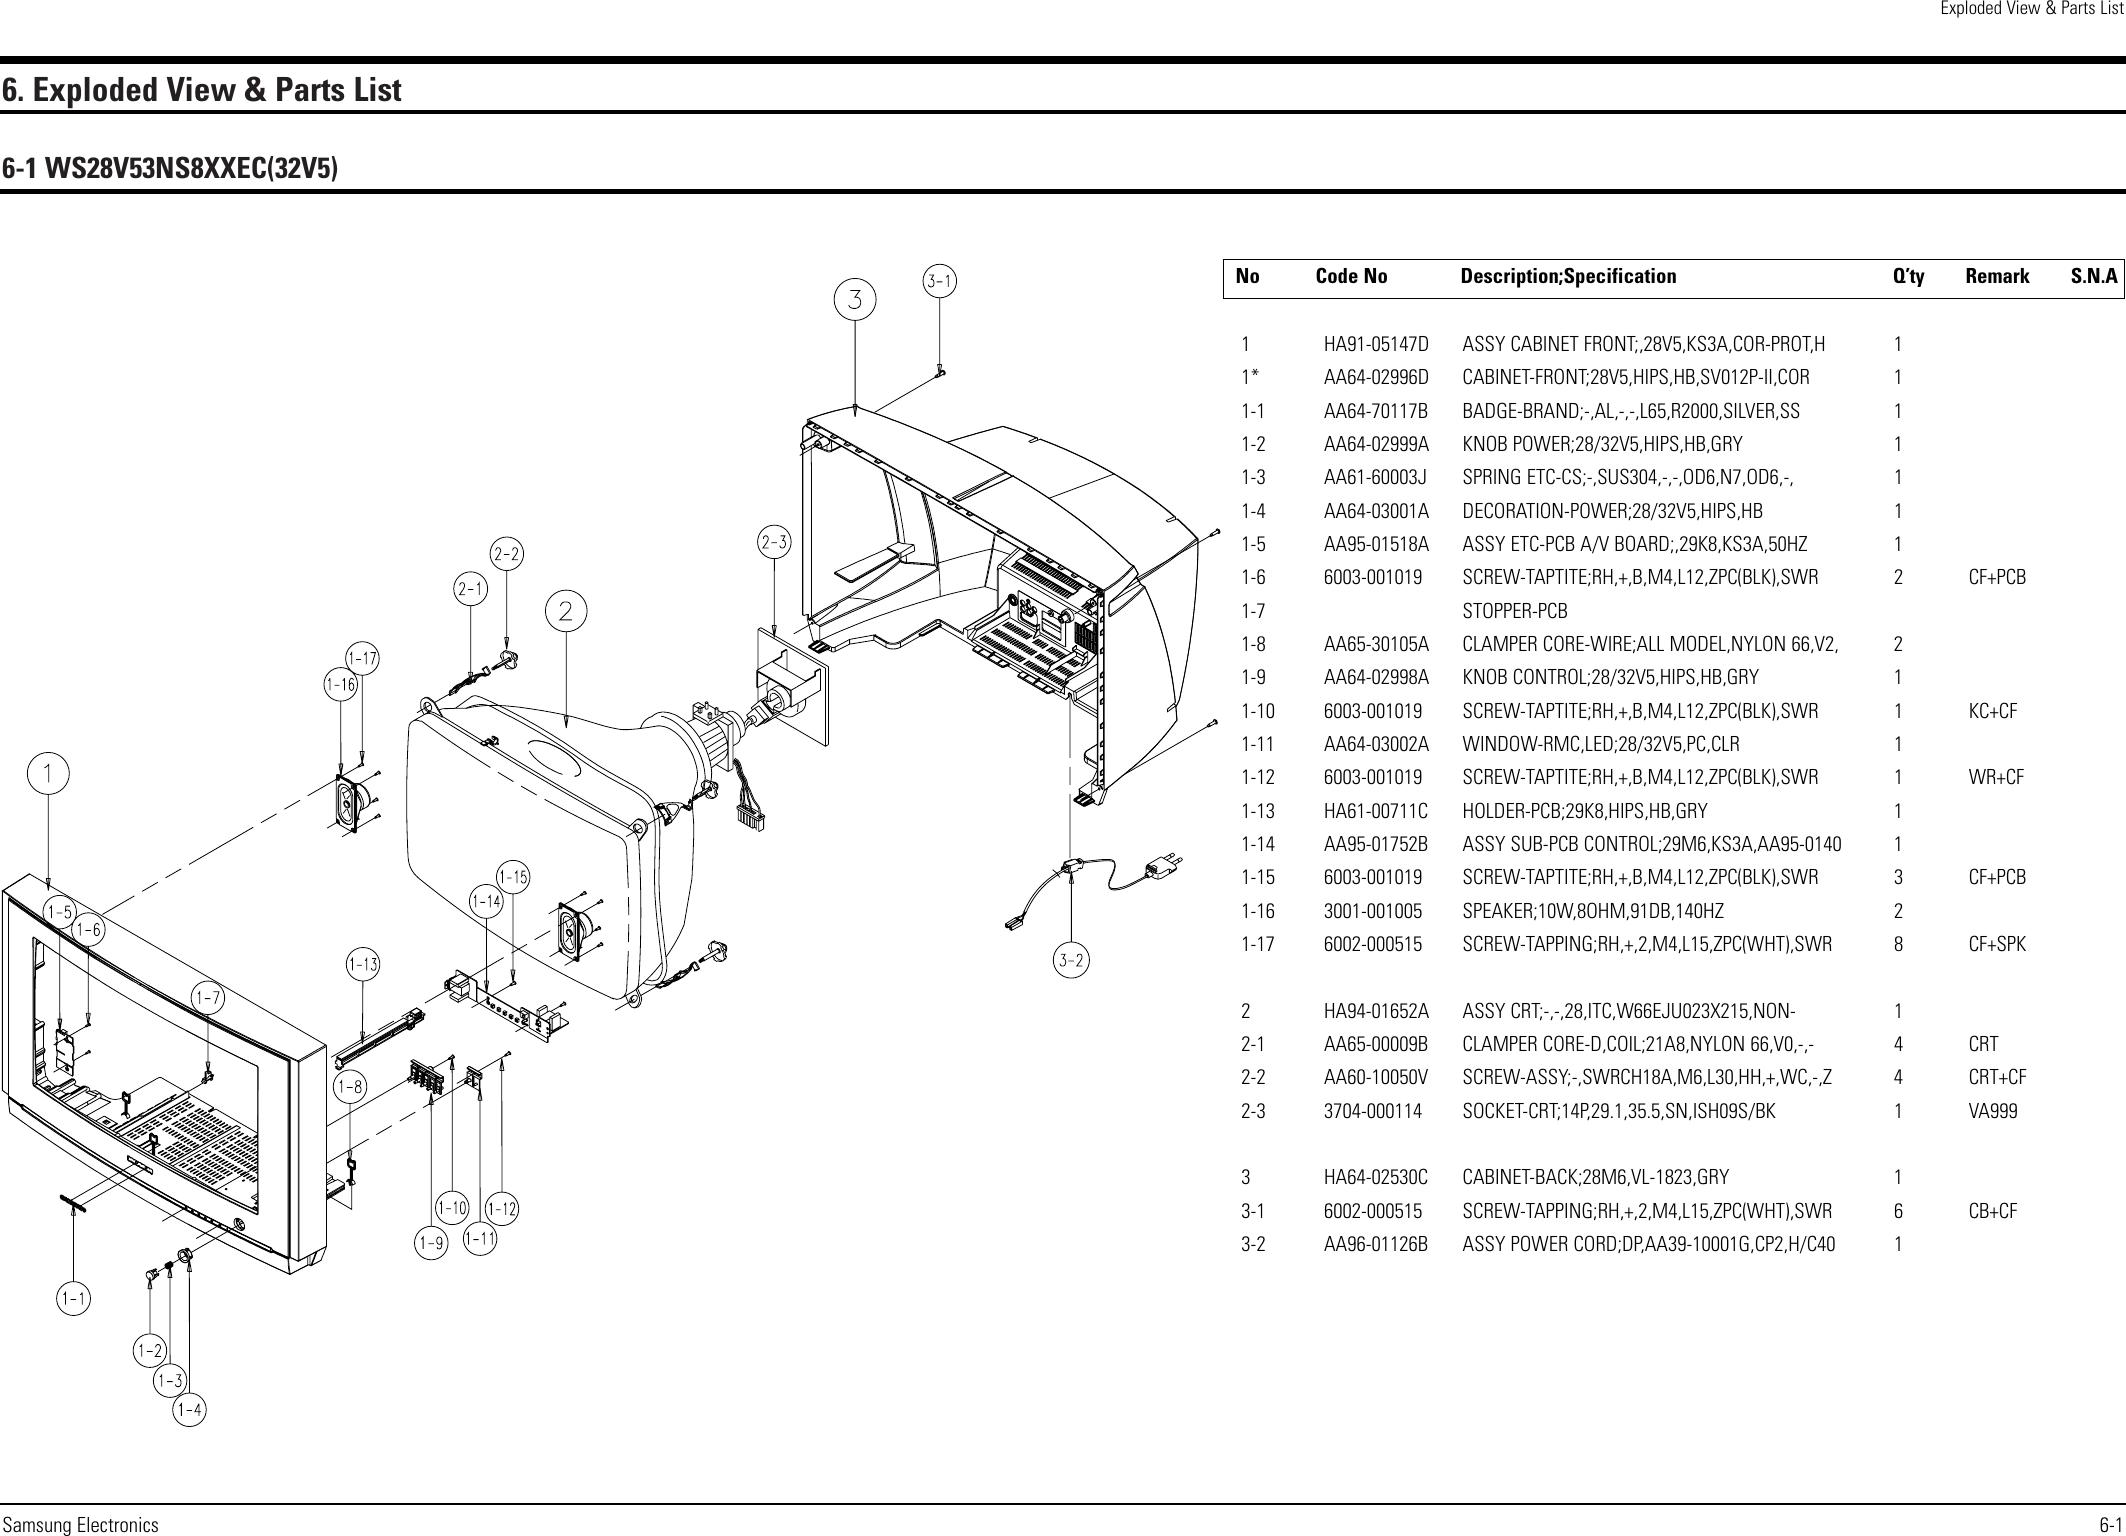 Samsung Ws28V53Ns8Xxec Users Manual KS3A 0820 COVER